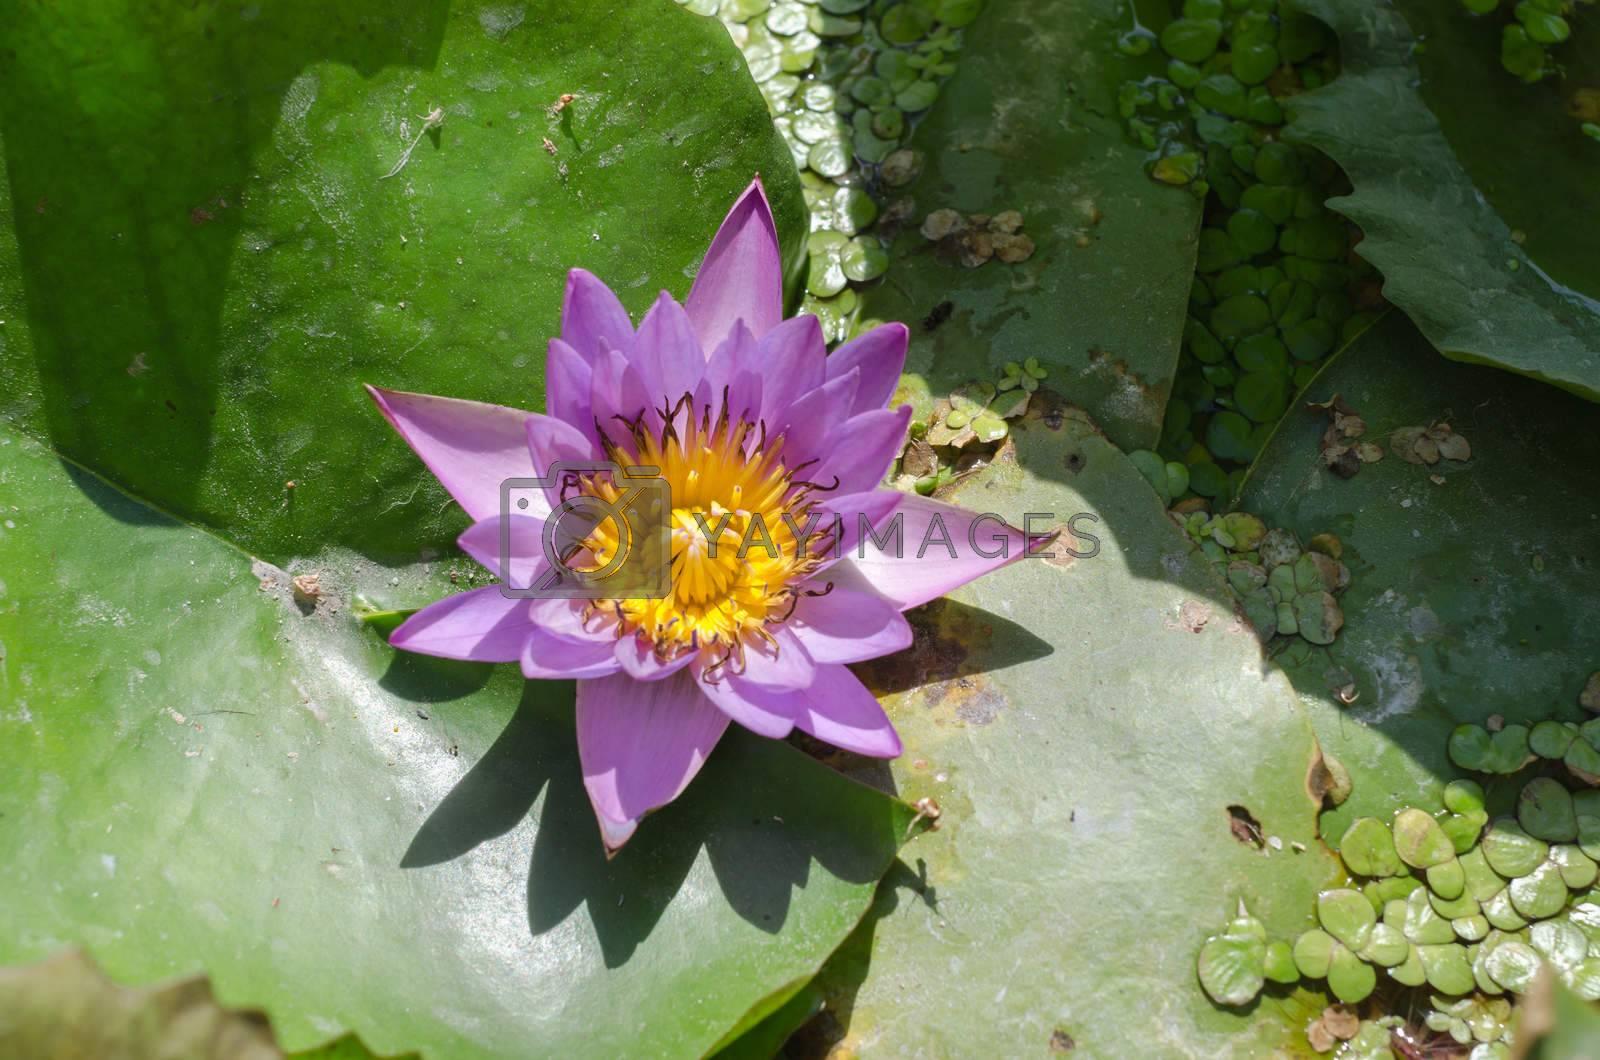 soft purple lotus flower floats in autumn pond.